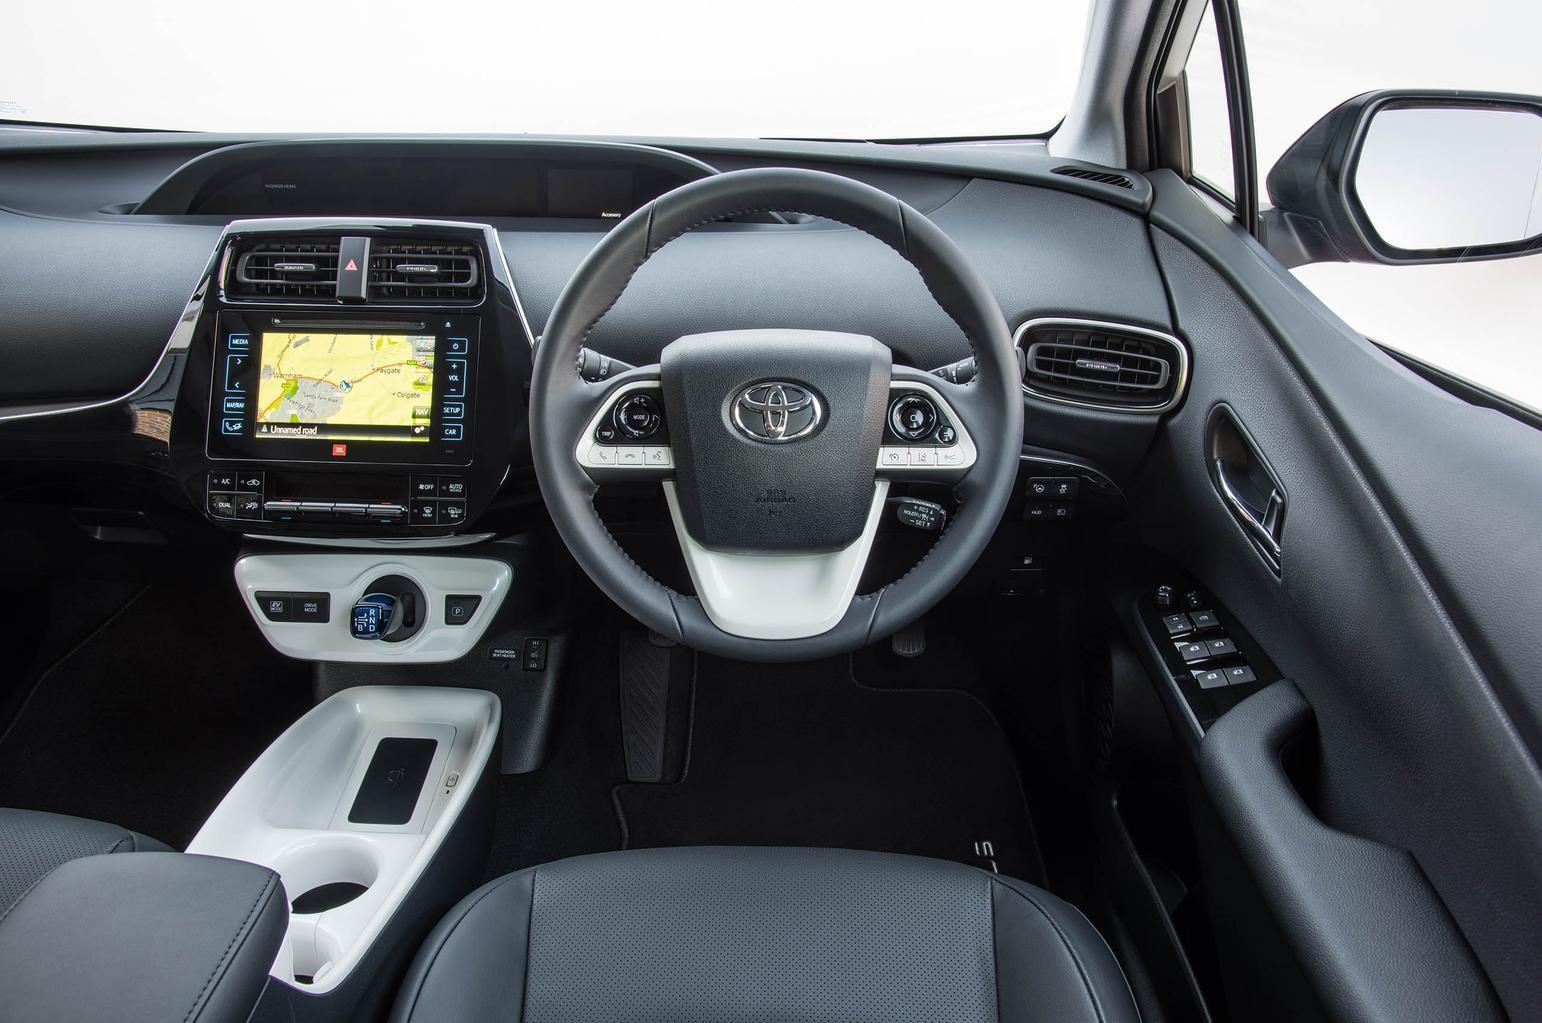 Toyota Prius 1.8 VVTi - interior